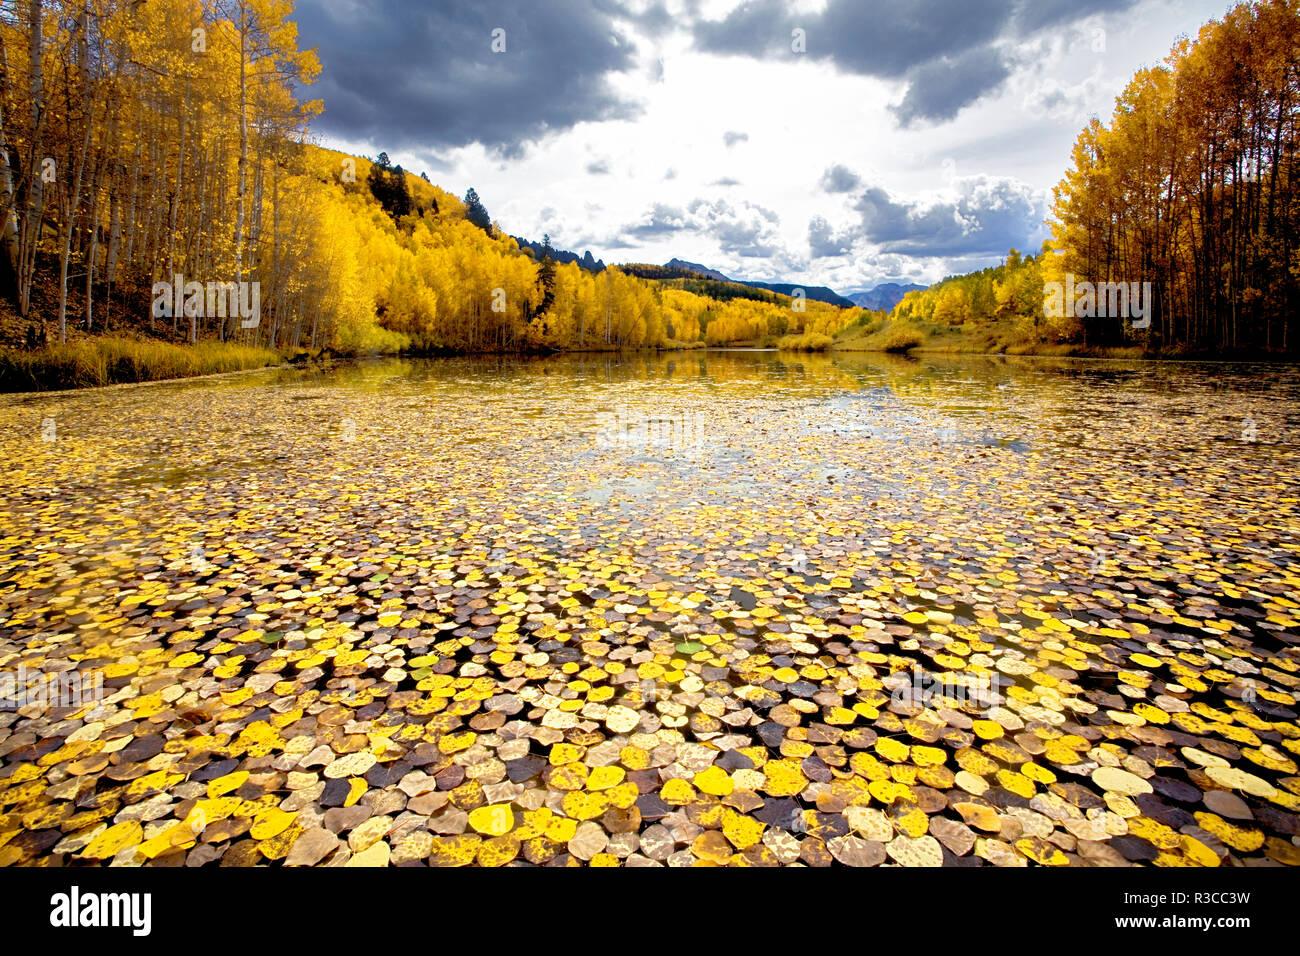 USA. Colorado, Uncompahgre National Forest, Herbst, Teich Stockbild